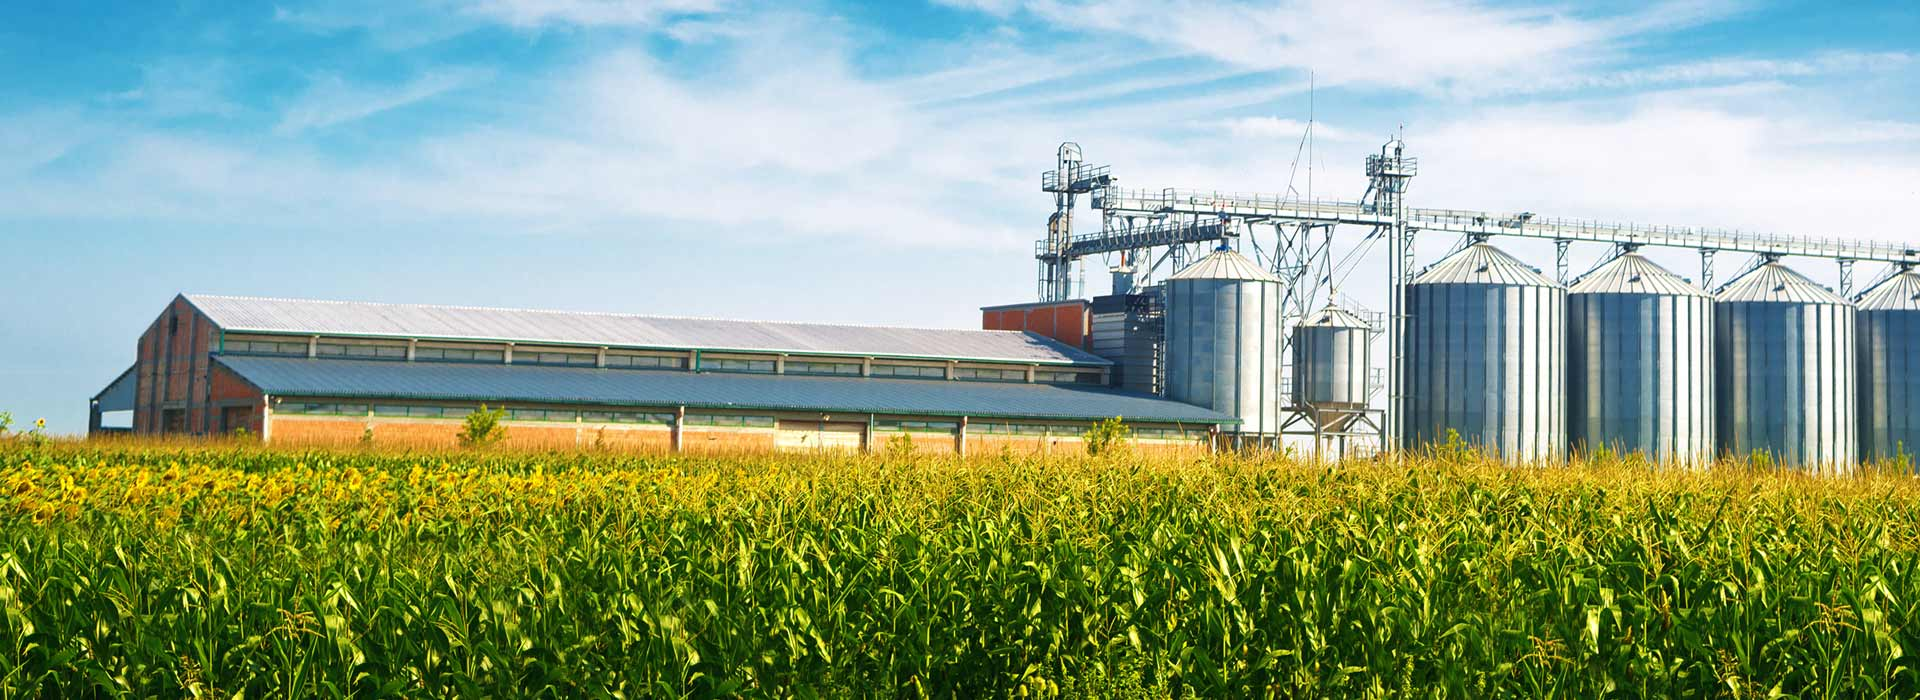 banner-grain-plant